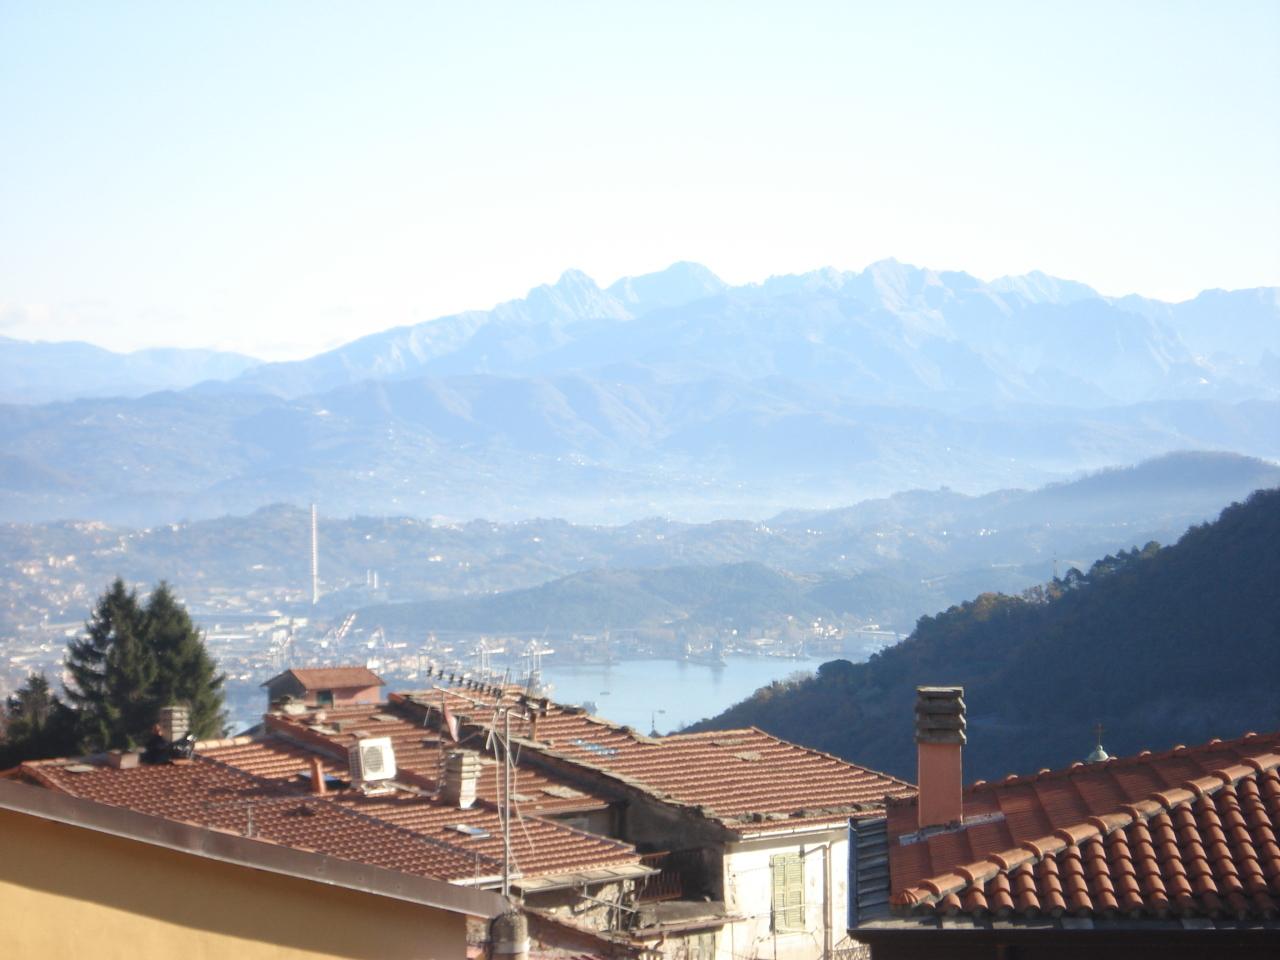 Villa Affiancata - Schiera, biassa, Vendita - La Spezia